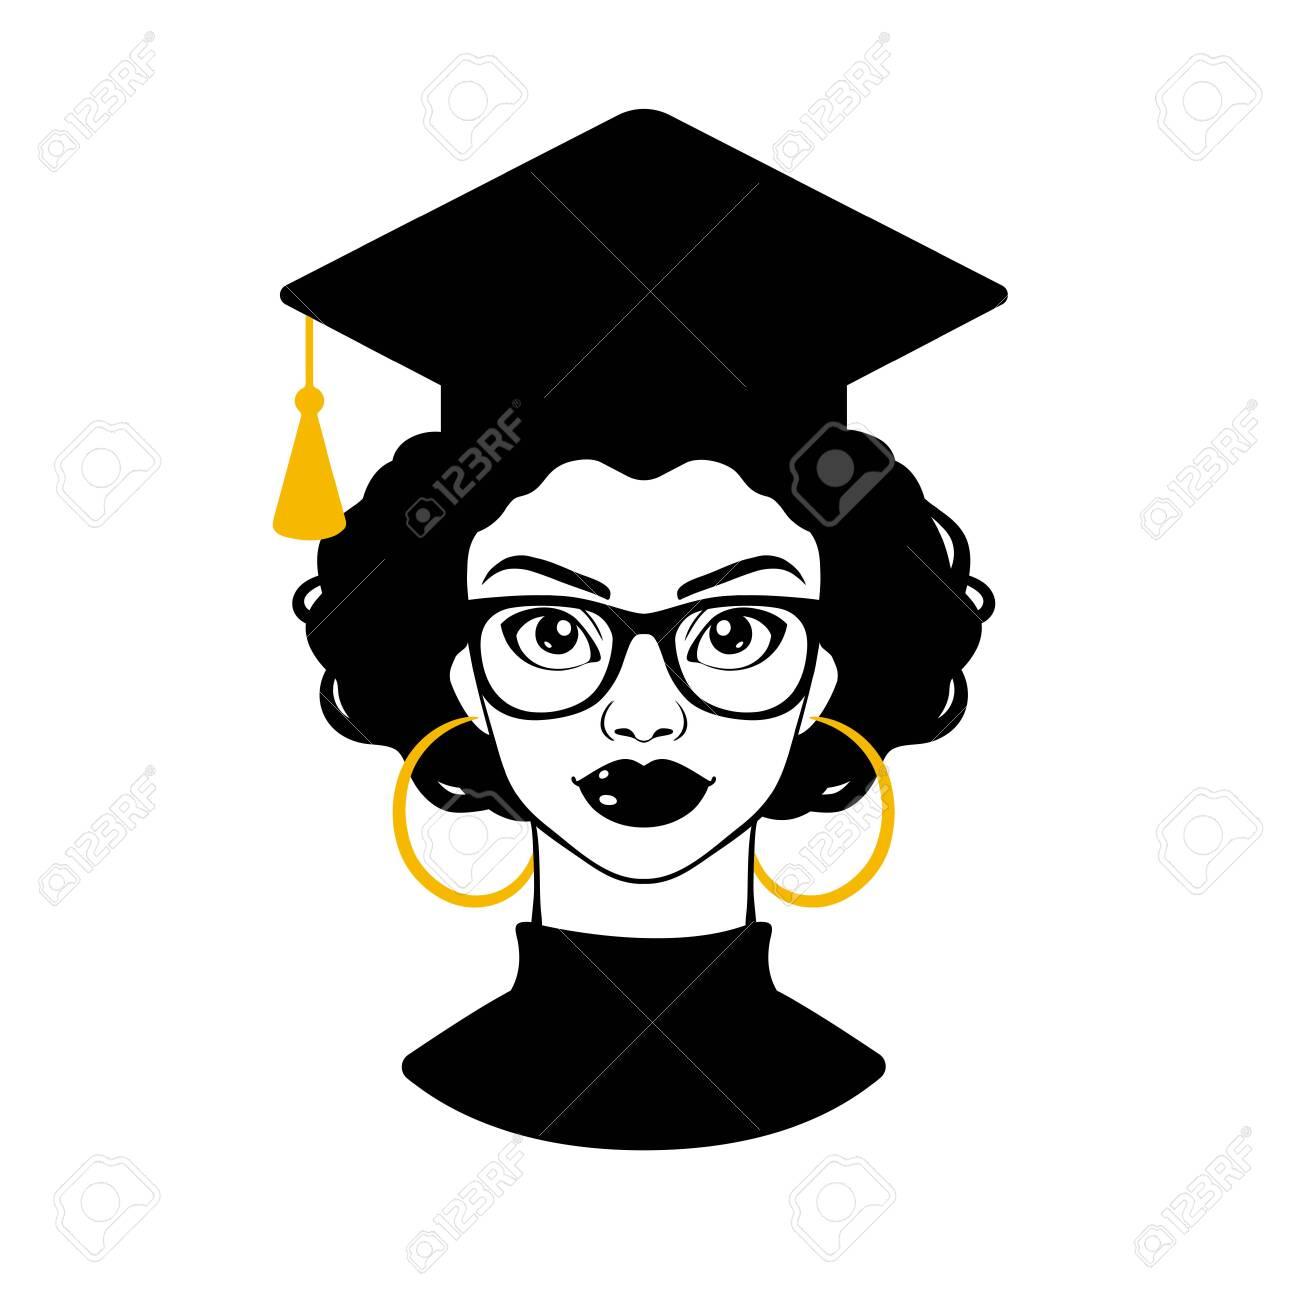 Graduate 2020. Graduation 2020. Senior 2020. Class of 2020. Black woman. Black girl in a graduation cap and glasses. College graduation. High school graduation. Vector clipart - 154610026